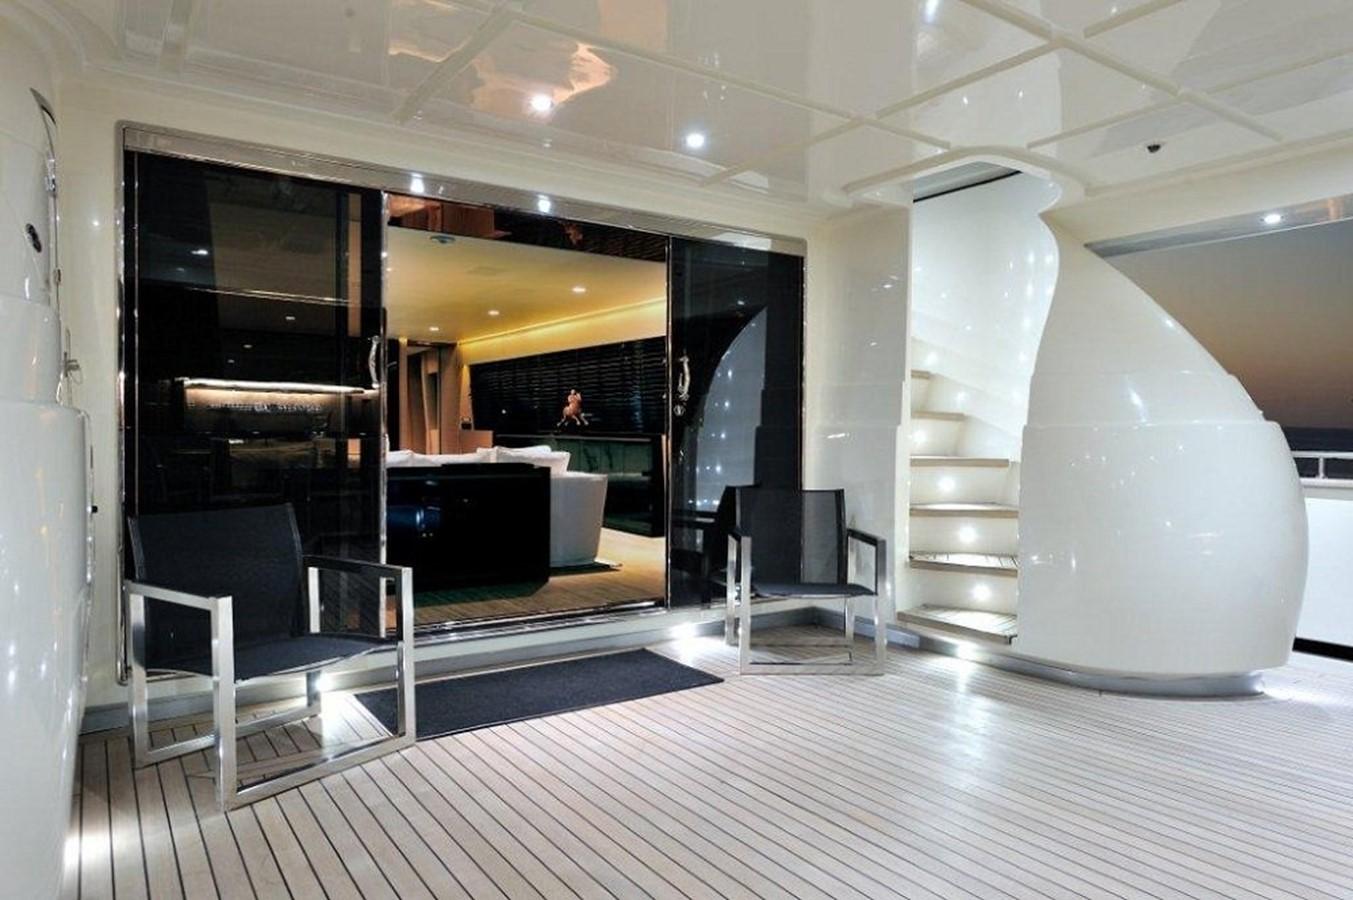 Canados 116 - Bertona - Aft Deck 2011 CANADOS 116 Motor Yacht 2062410